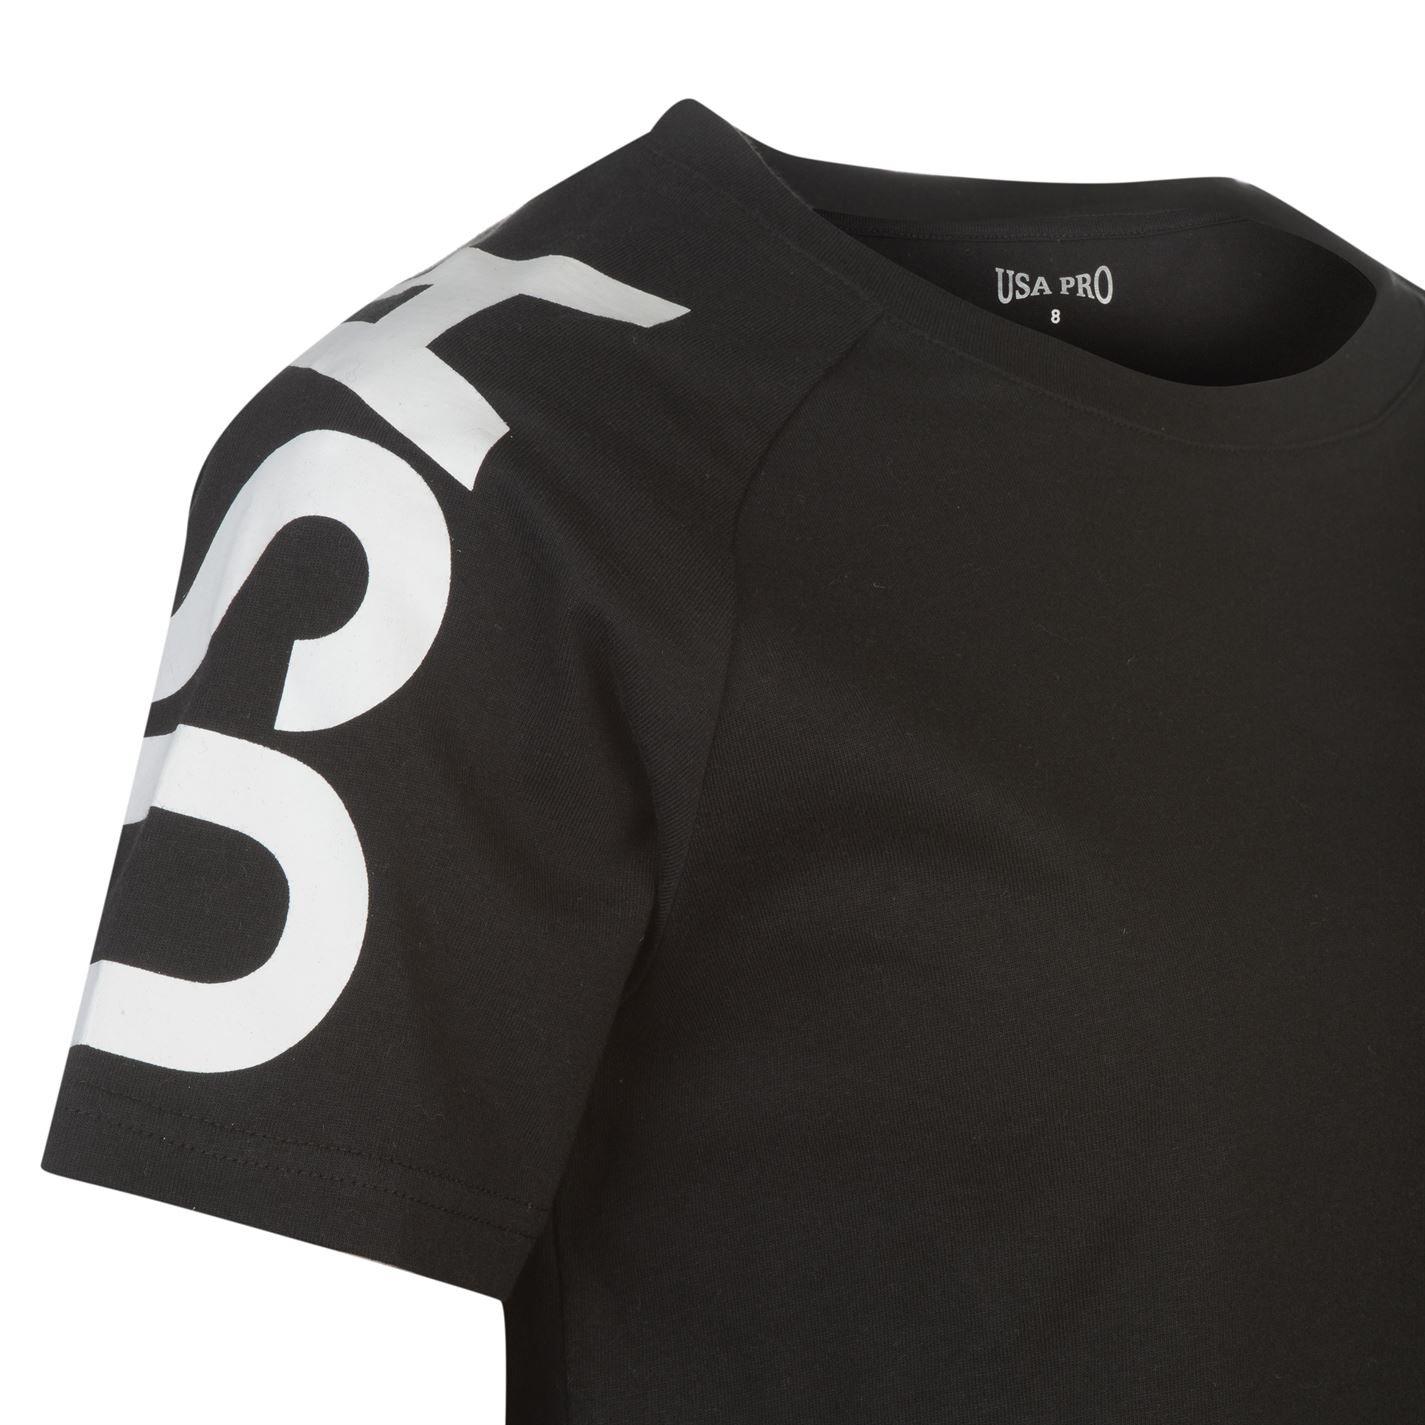 USA Pro Damen Cropped T-Shirt Bauchfrei